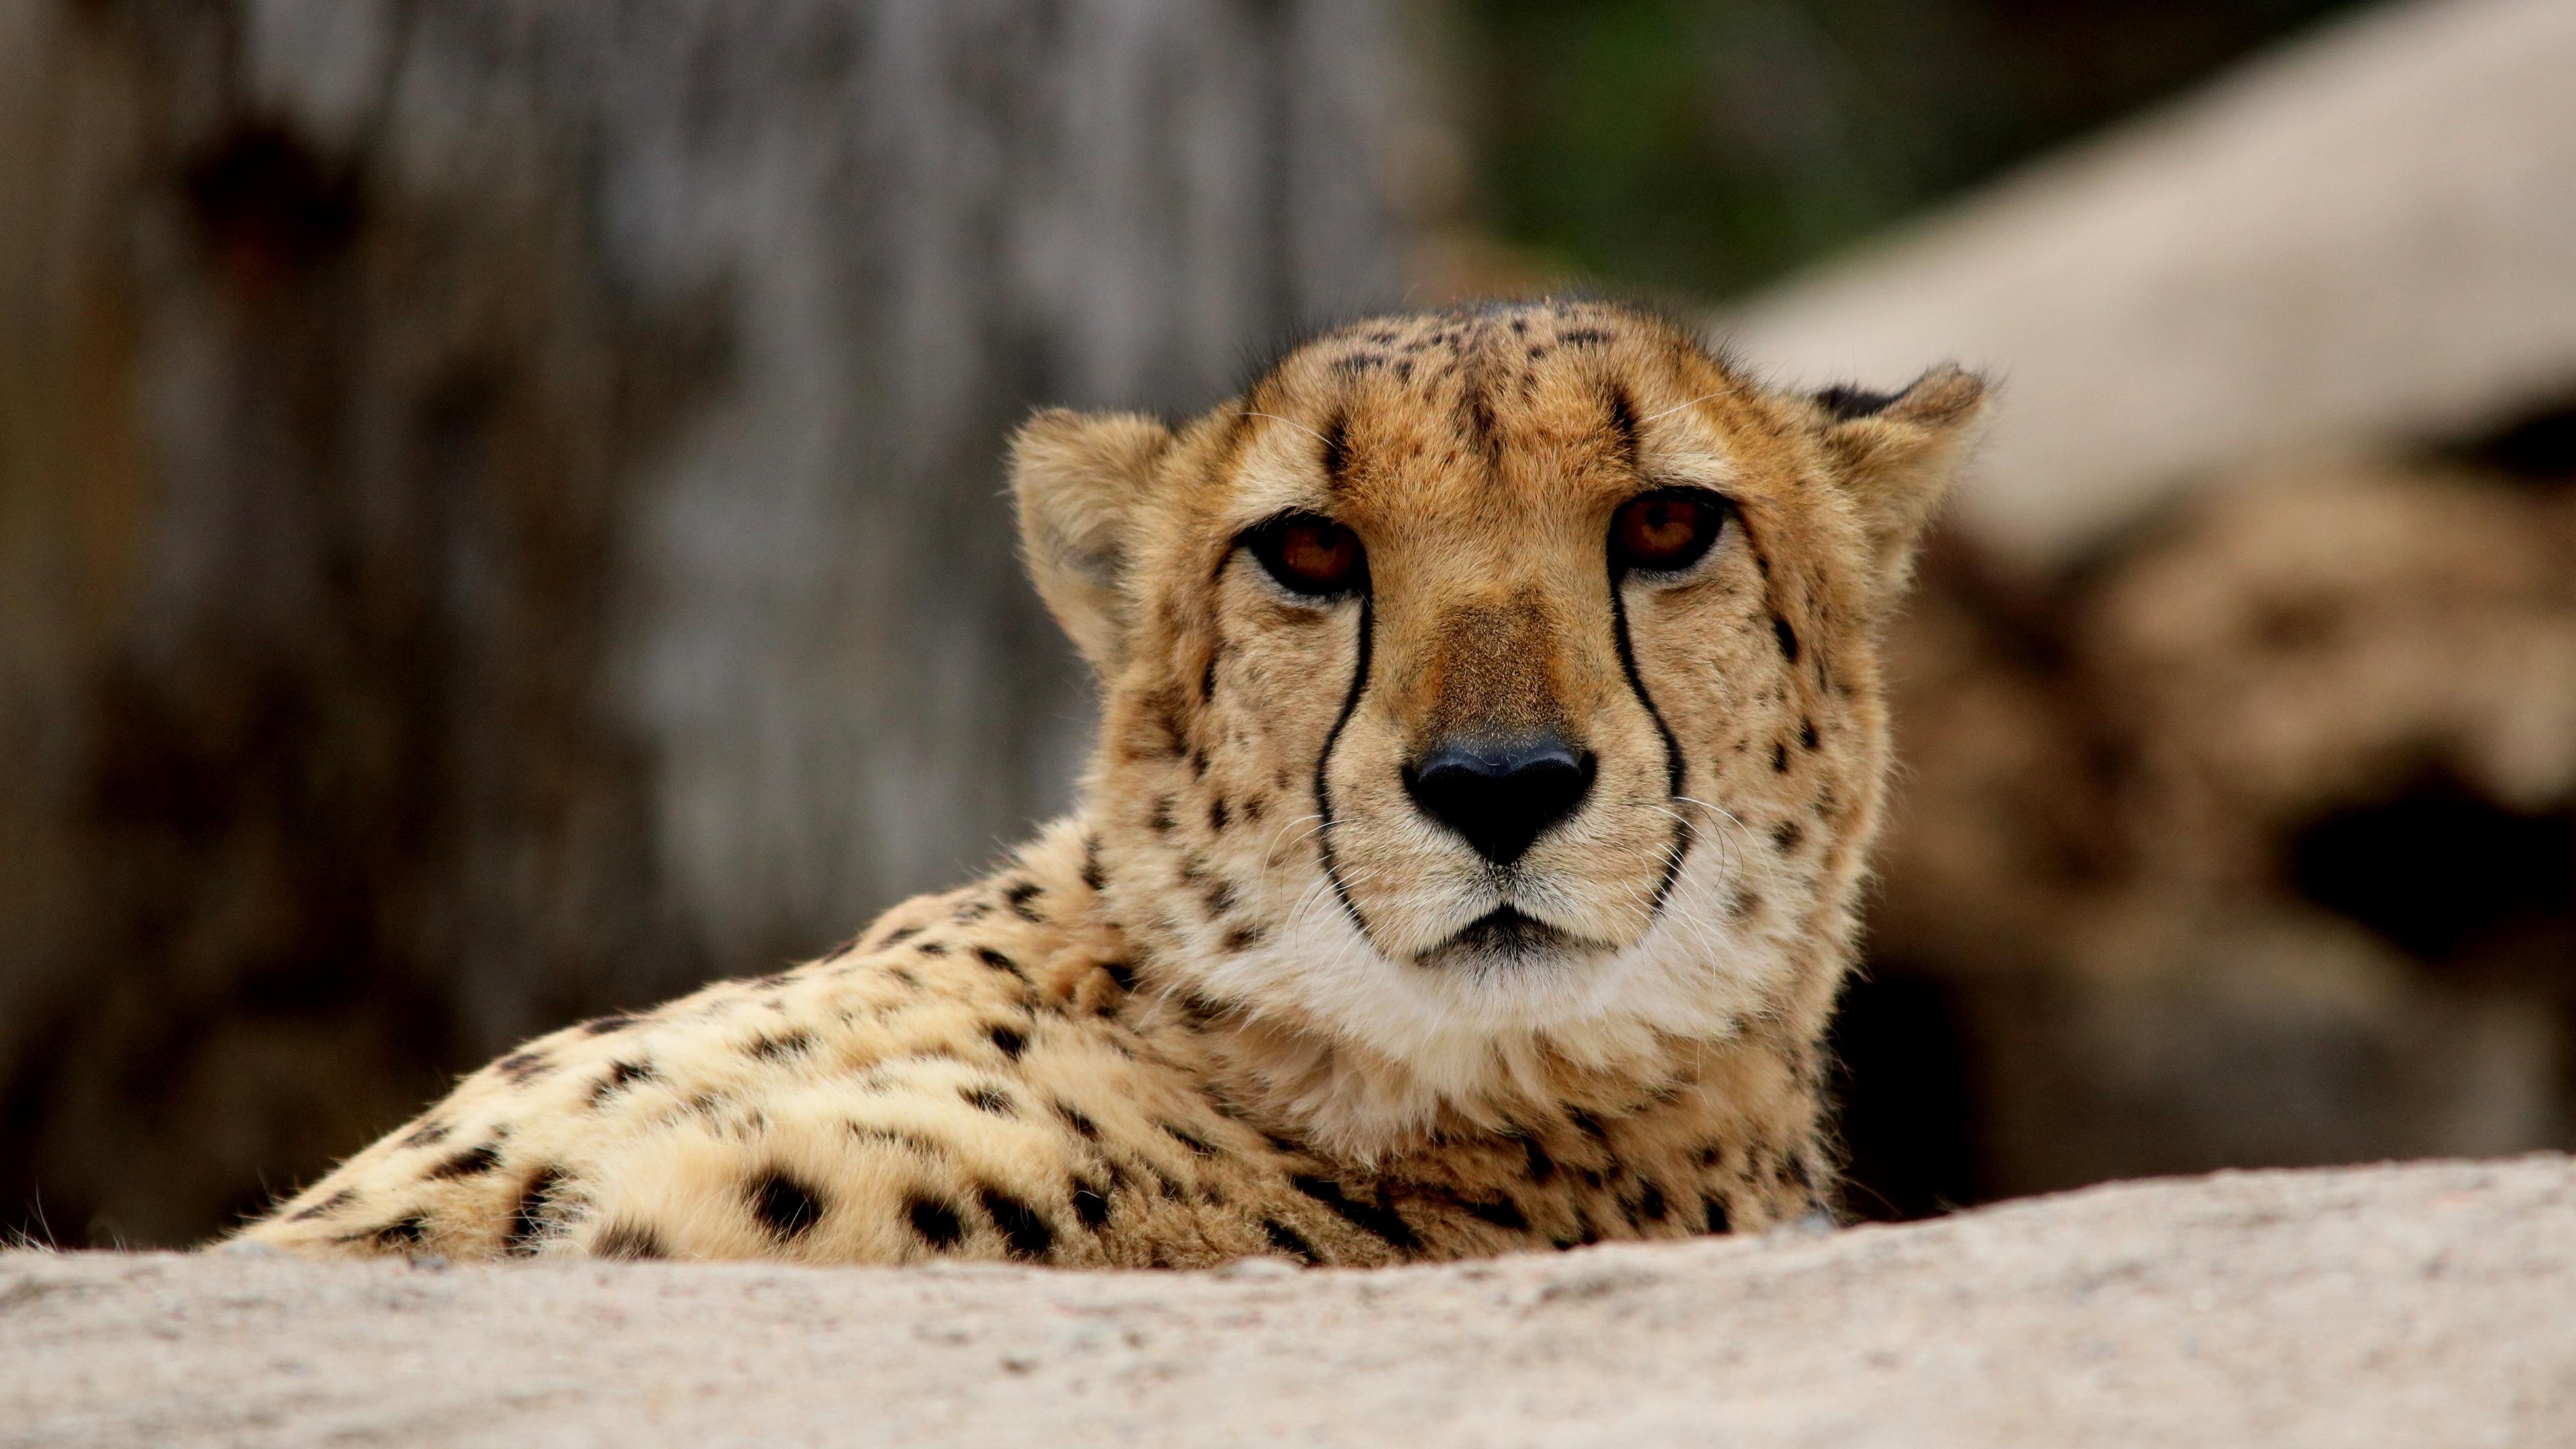 cheetah predator muzzle 4k 1542242450 - cheetah, predator, muzzle 4k - Predator, muzzle, Cheetah